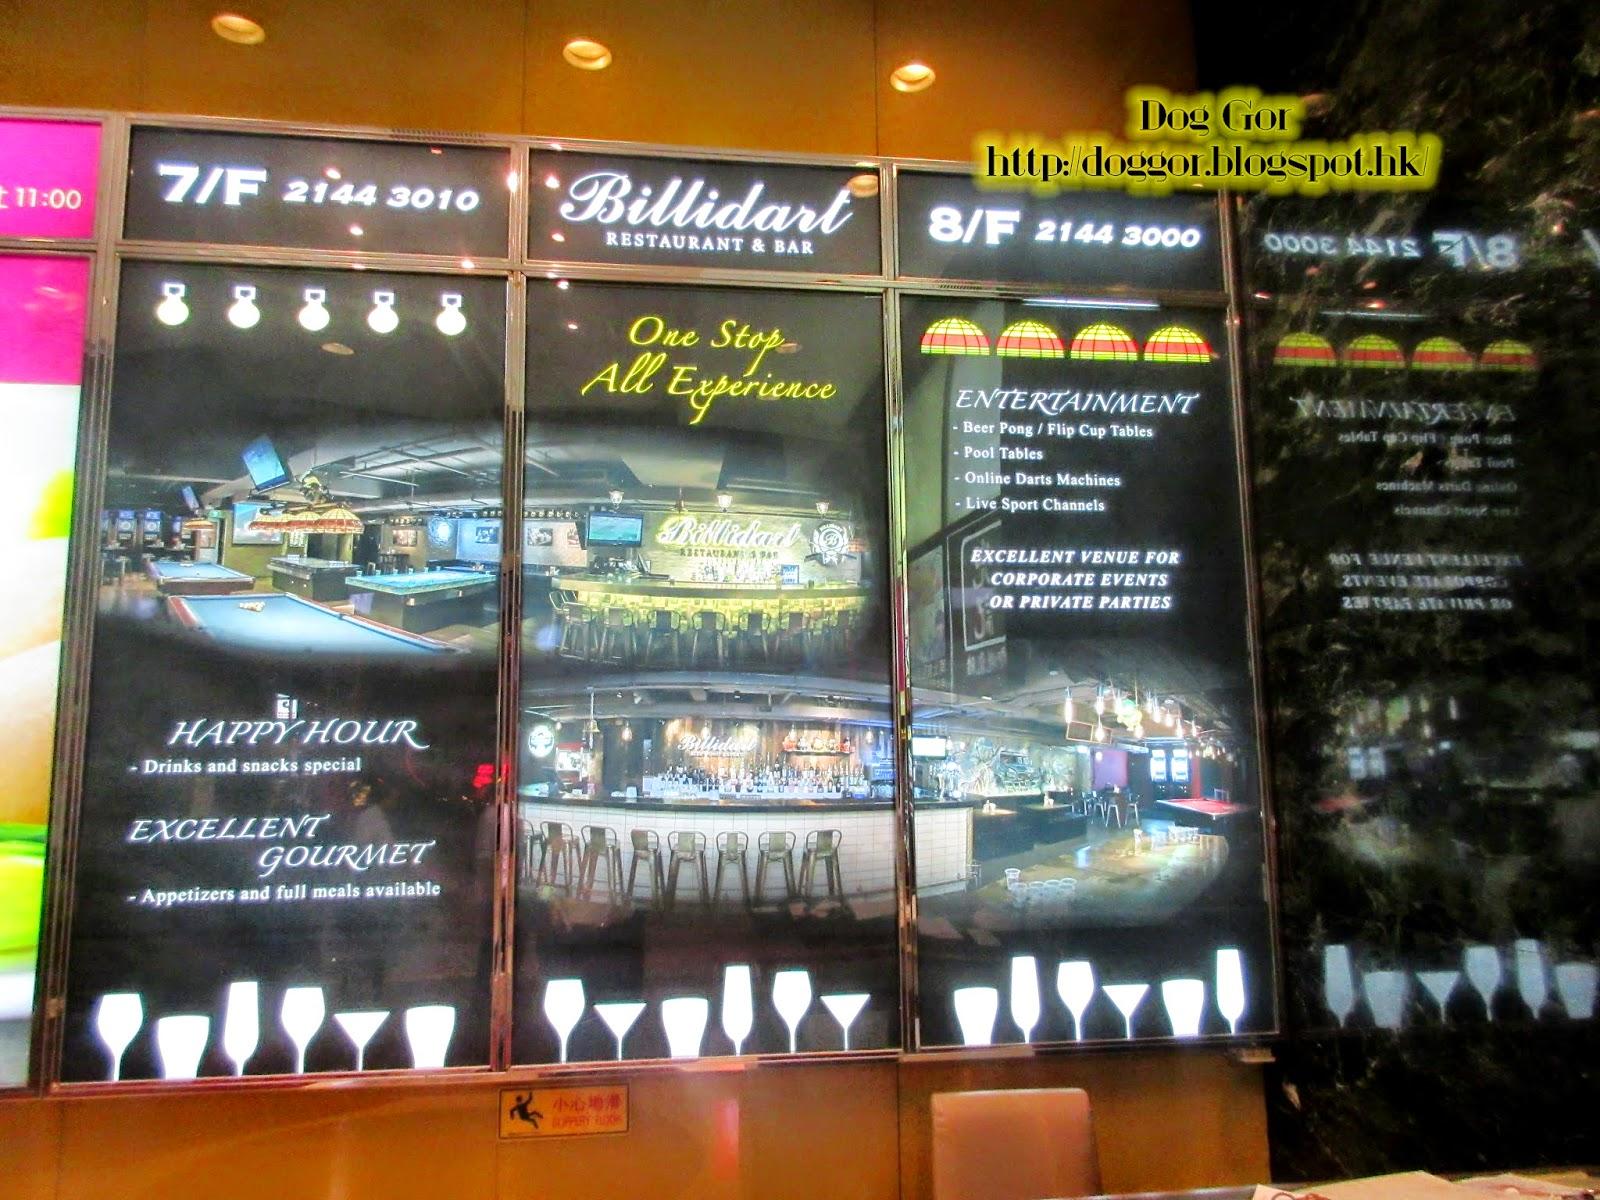 Billidart Restaurant Bar